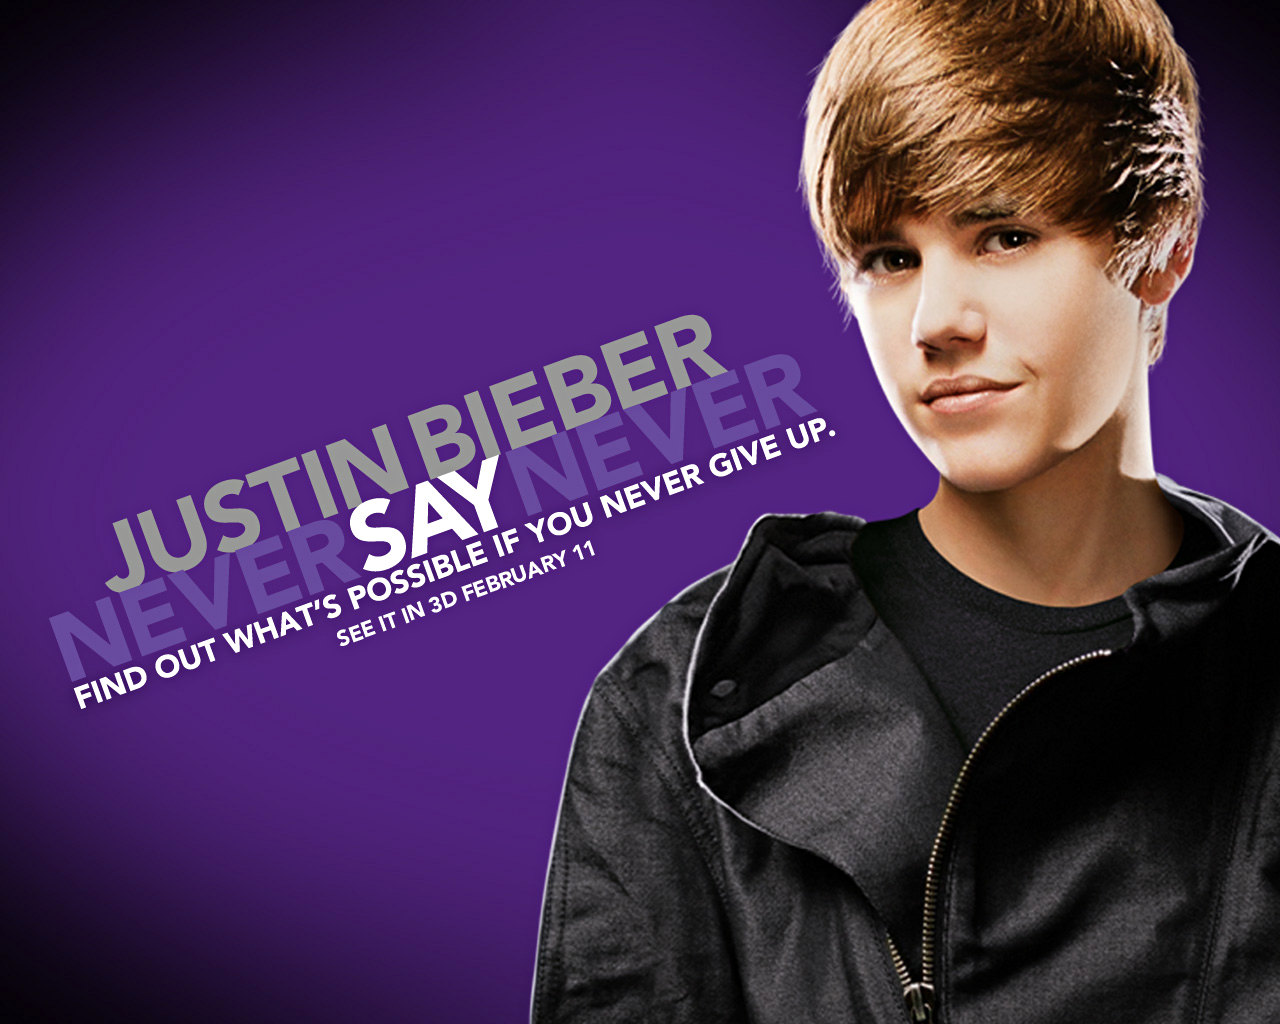 Justin_Nazanin - Justin Bieber Wallpaper (23534531) - Fanpop